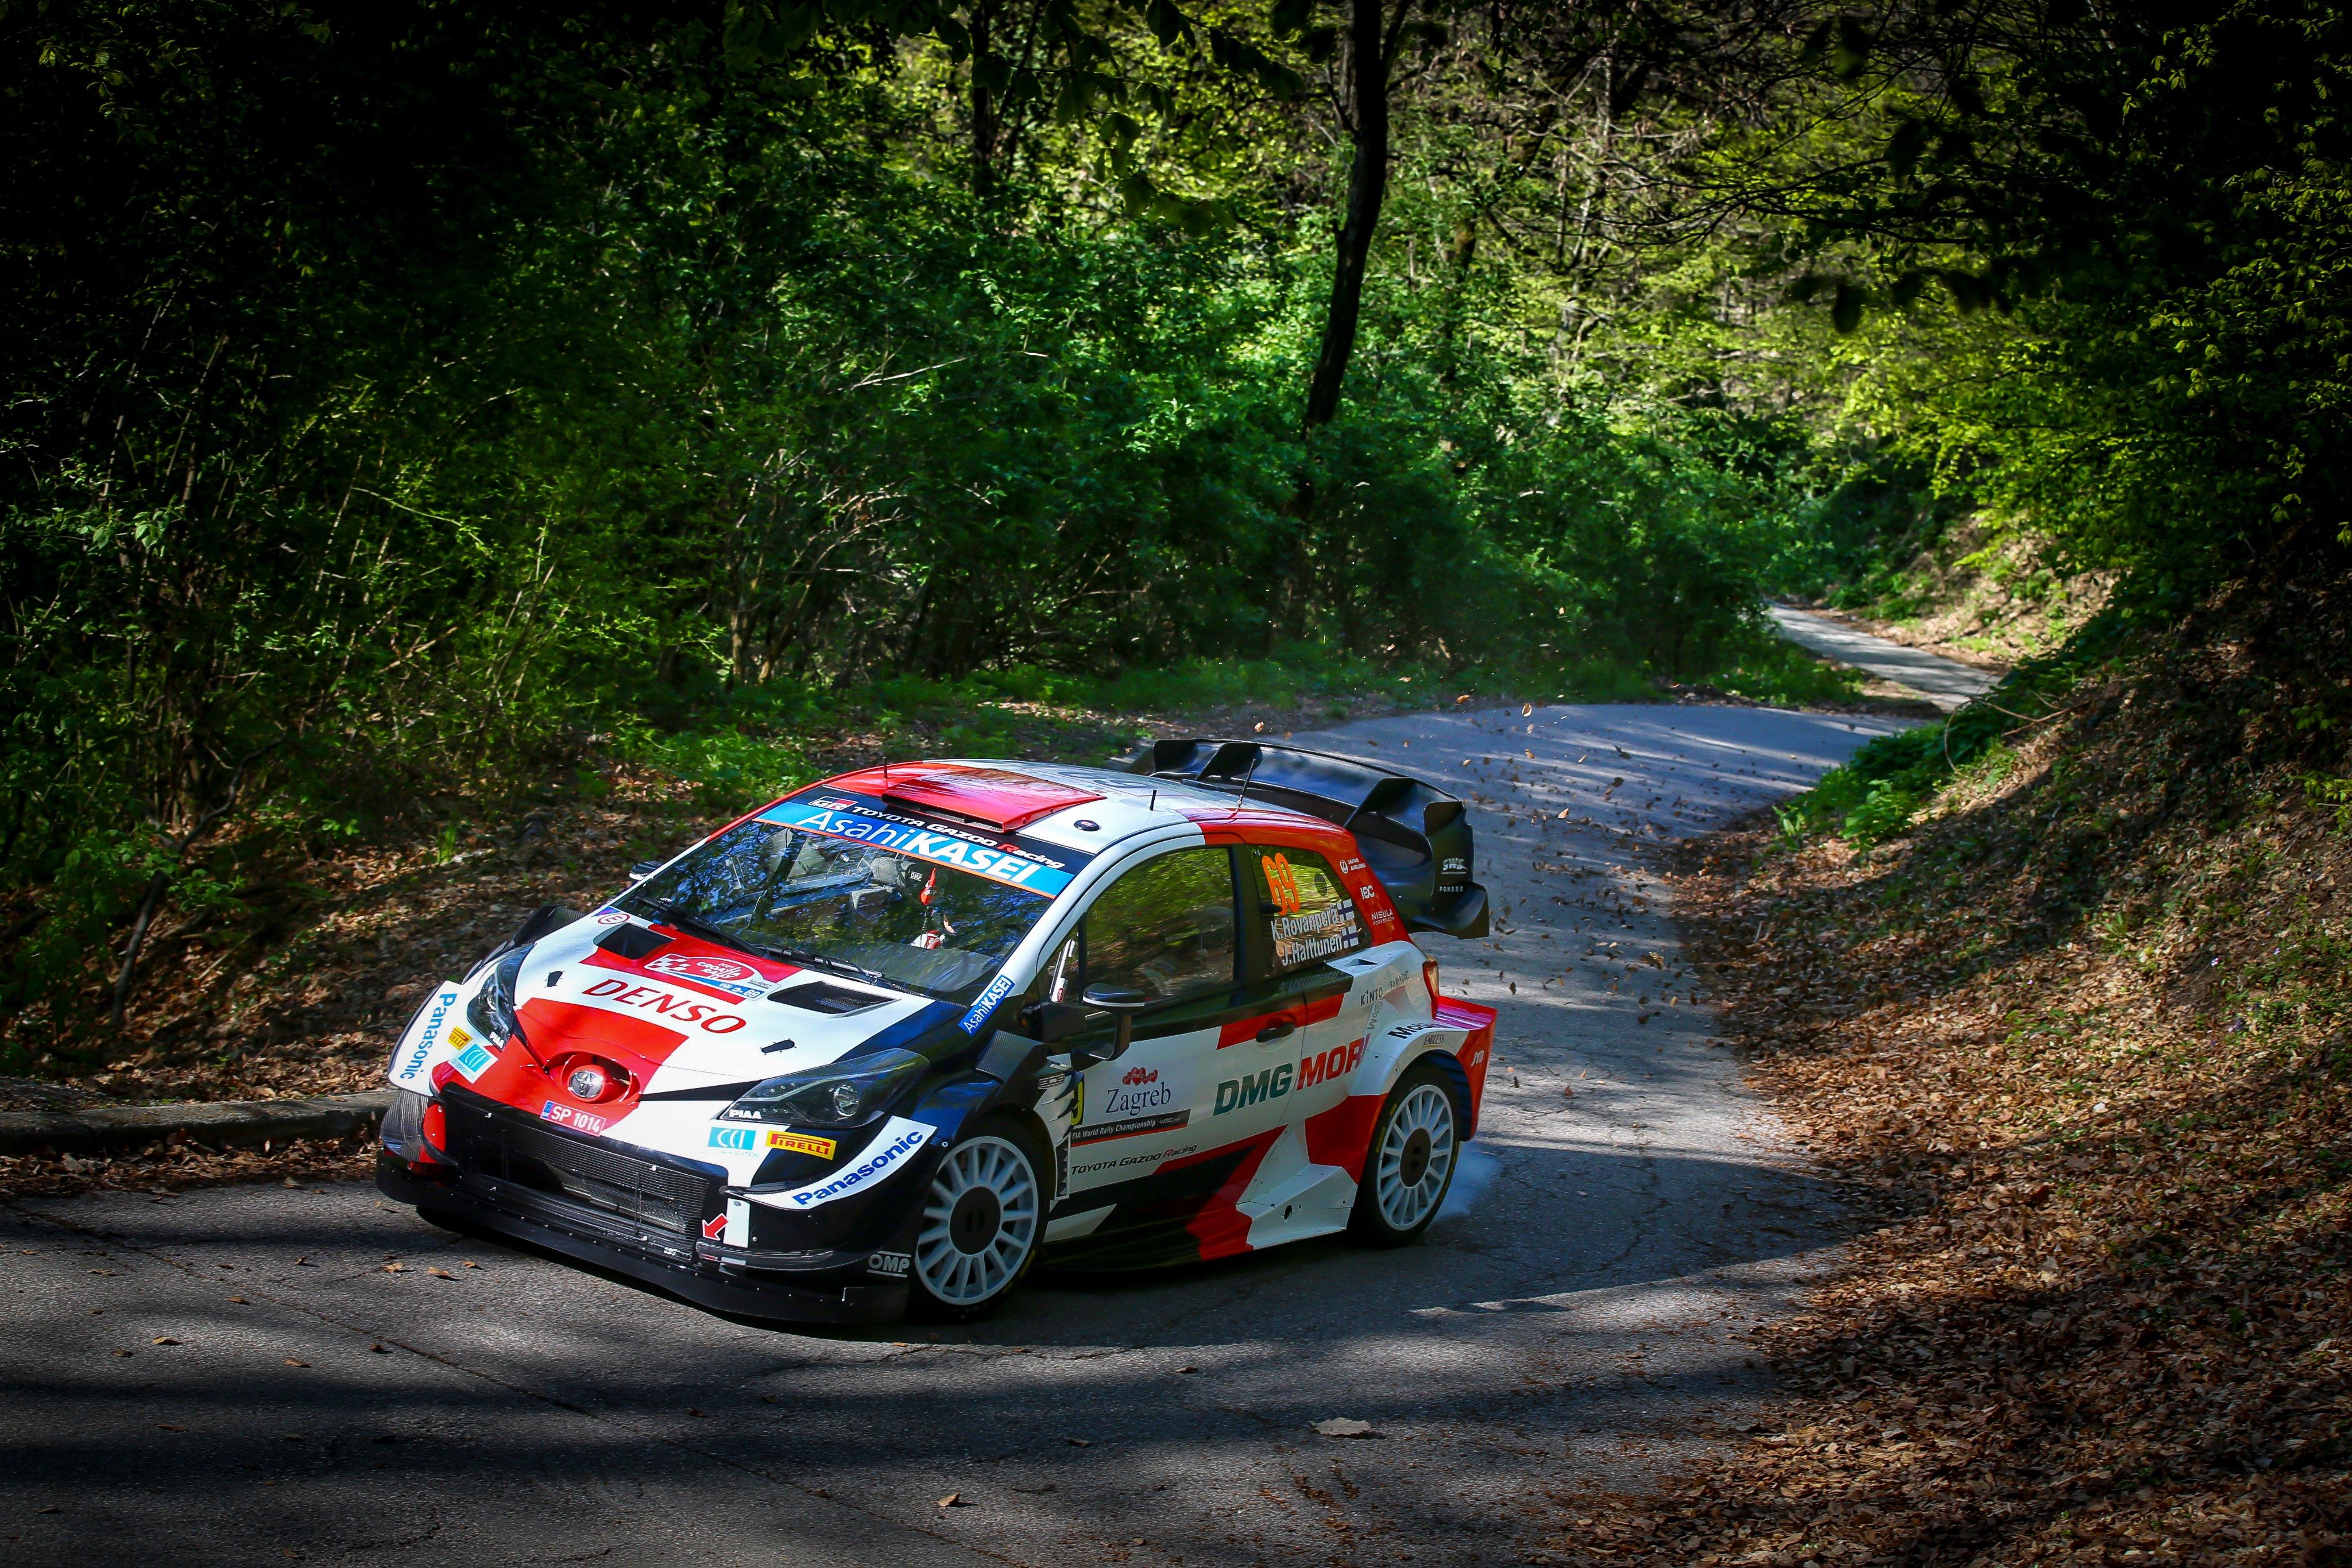 WRC: 46º Croatia Rally [22-25 Abril] - Página 3 Ezj8LNiWEAcX3ui?format=jpg&name=4096x4096